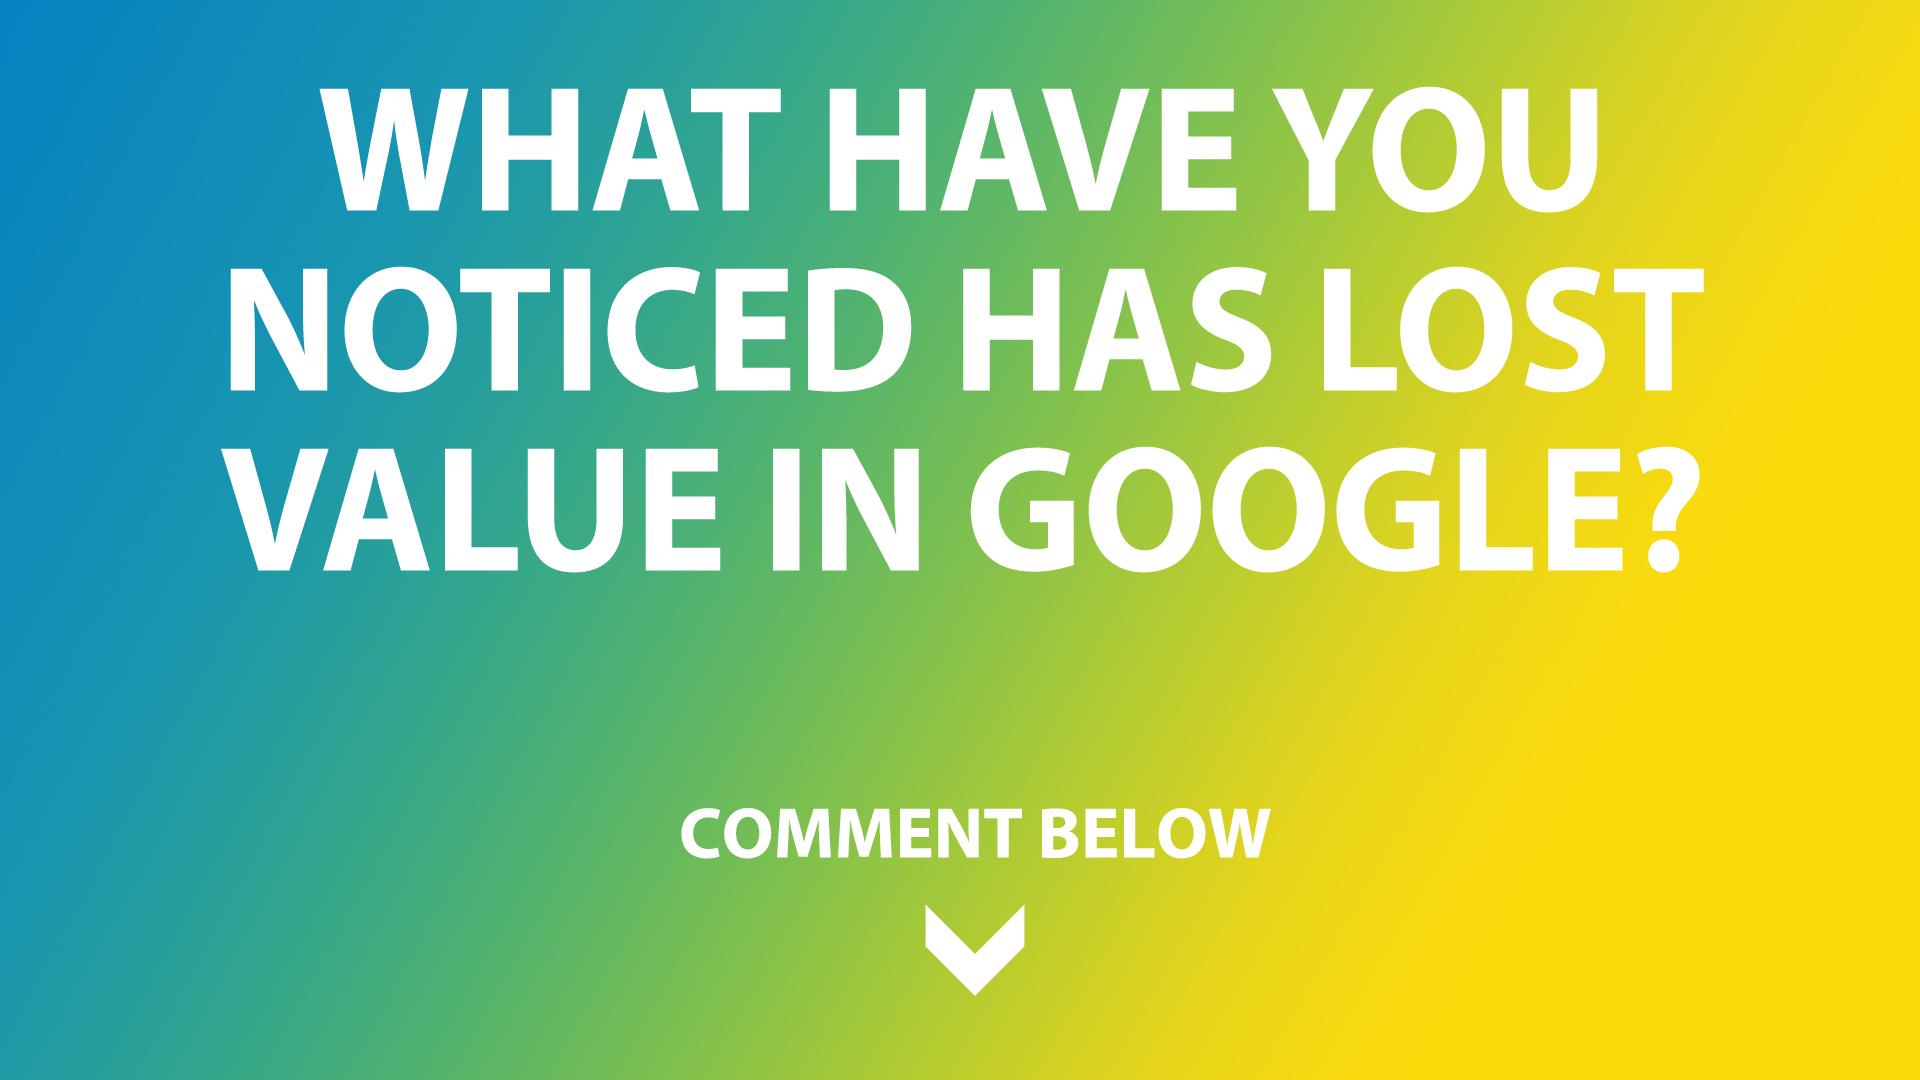 Google's values in SEO